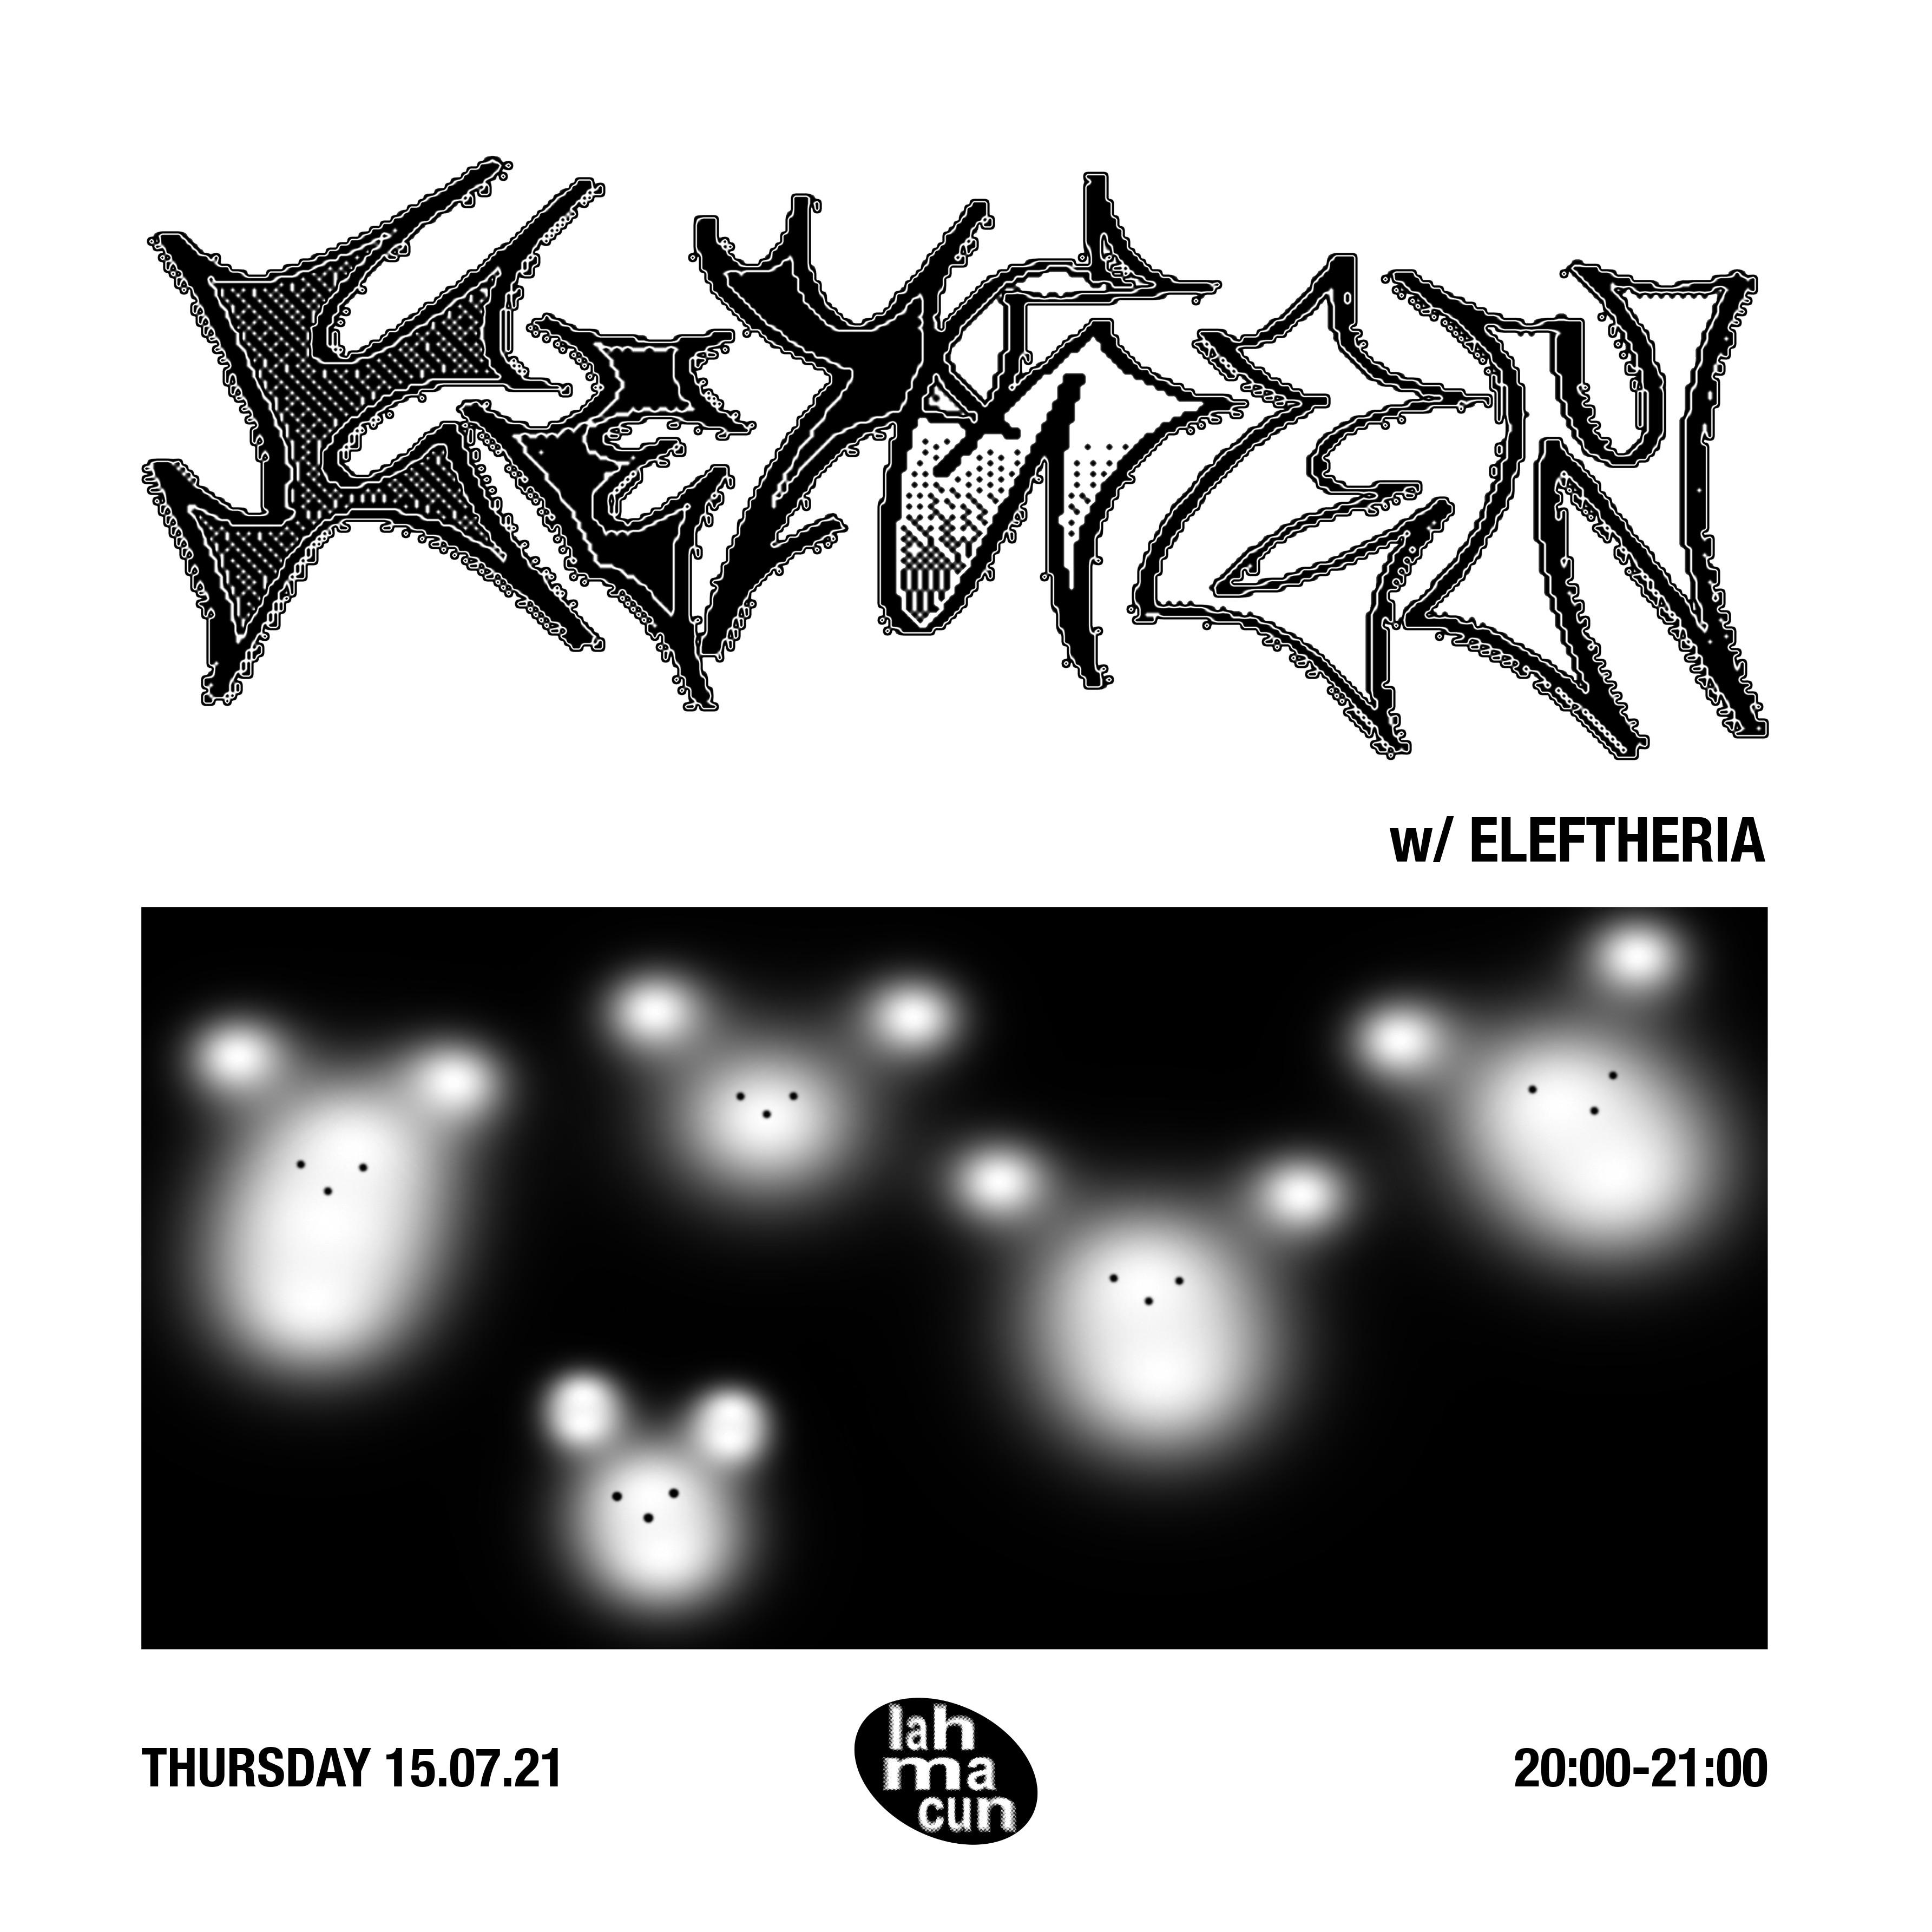 EP 2 - Eleftheria